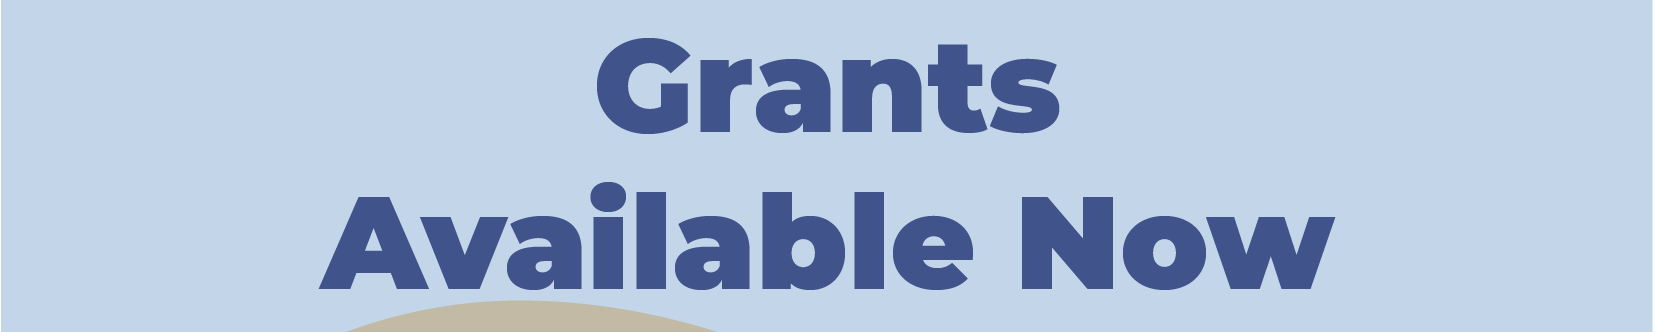 General grants roundup_blue